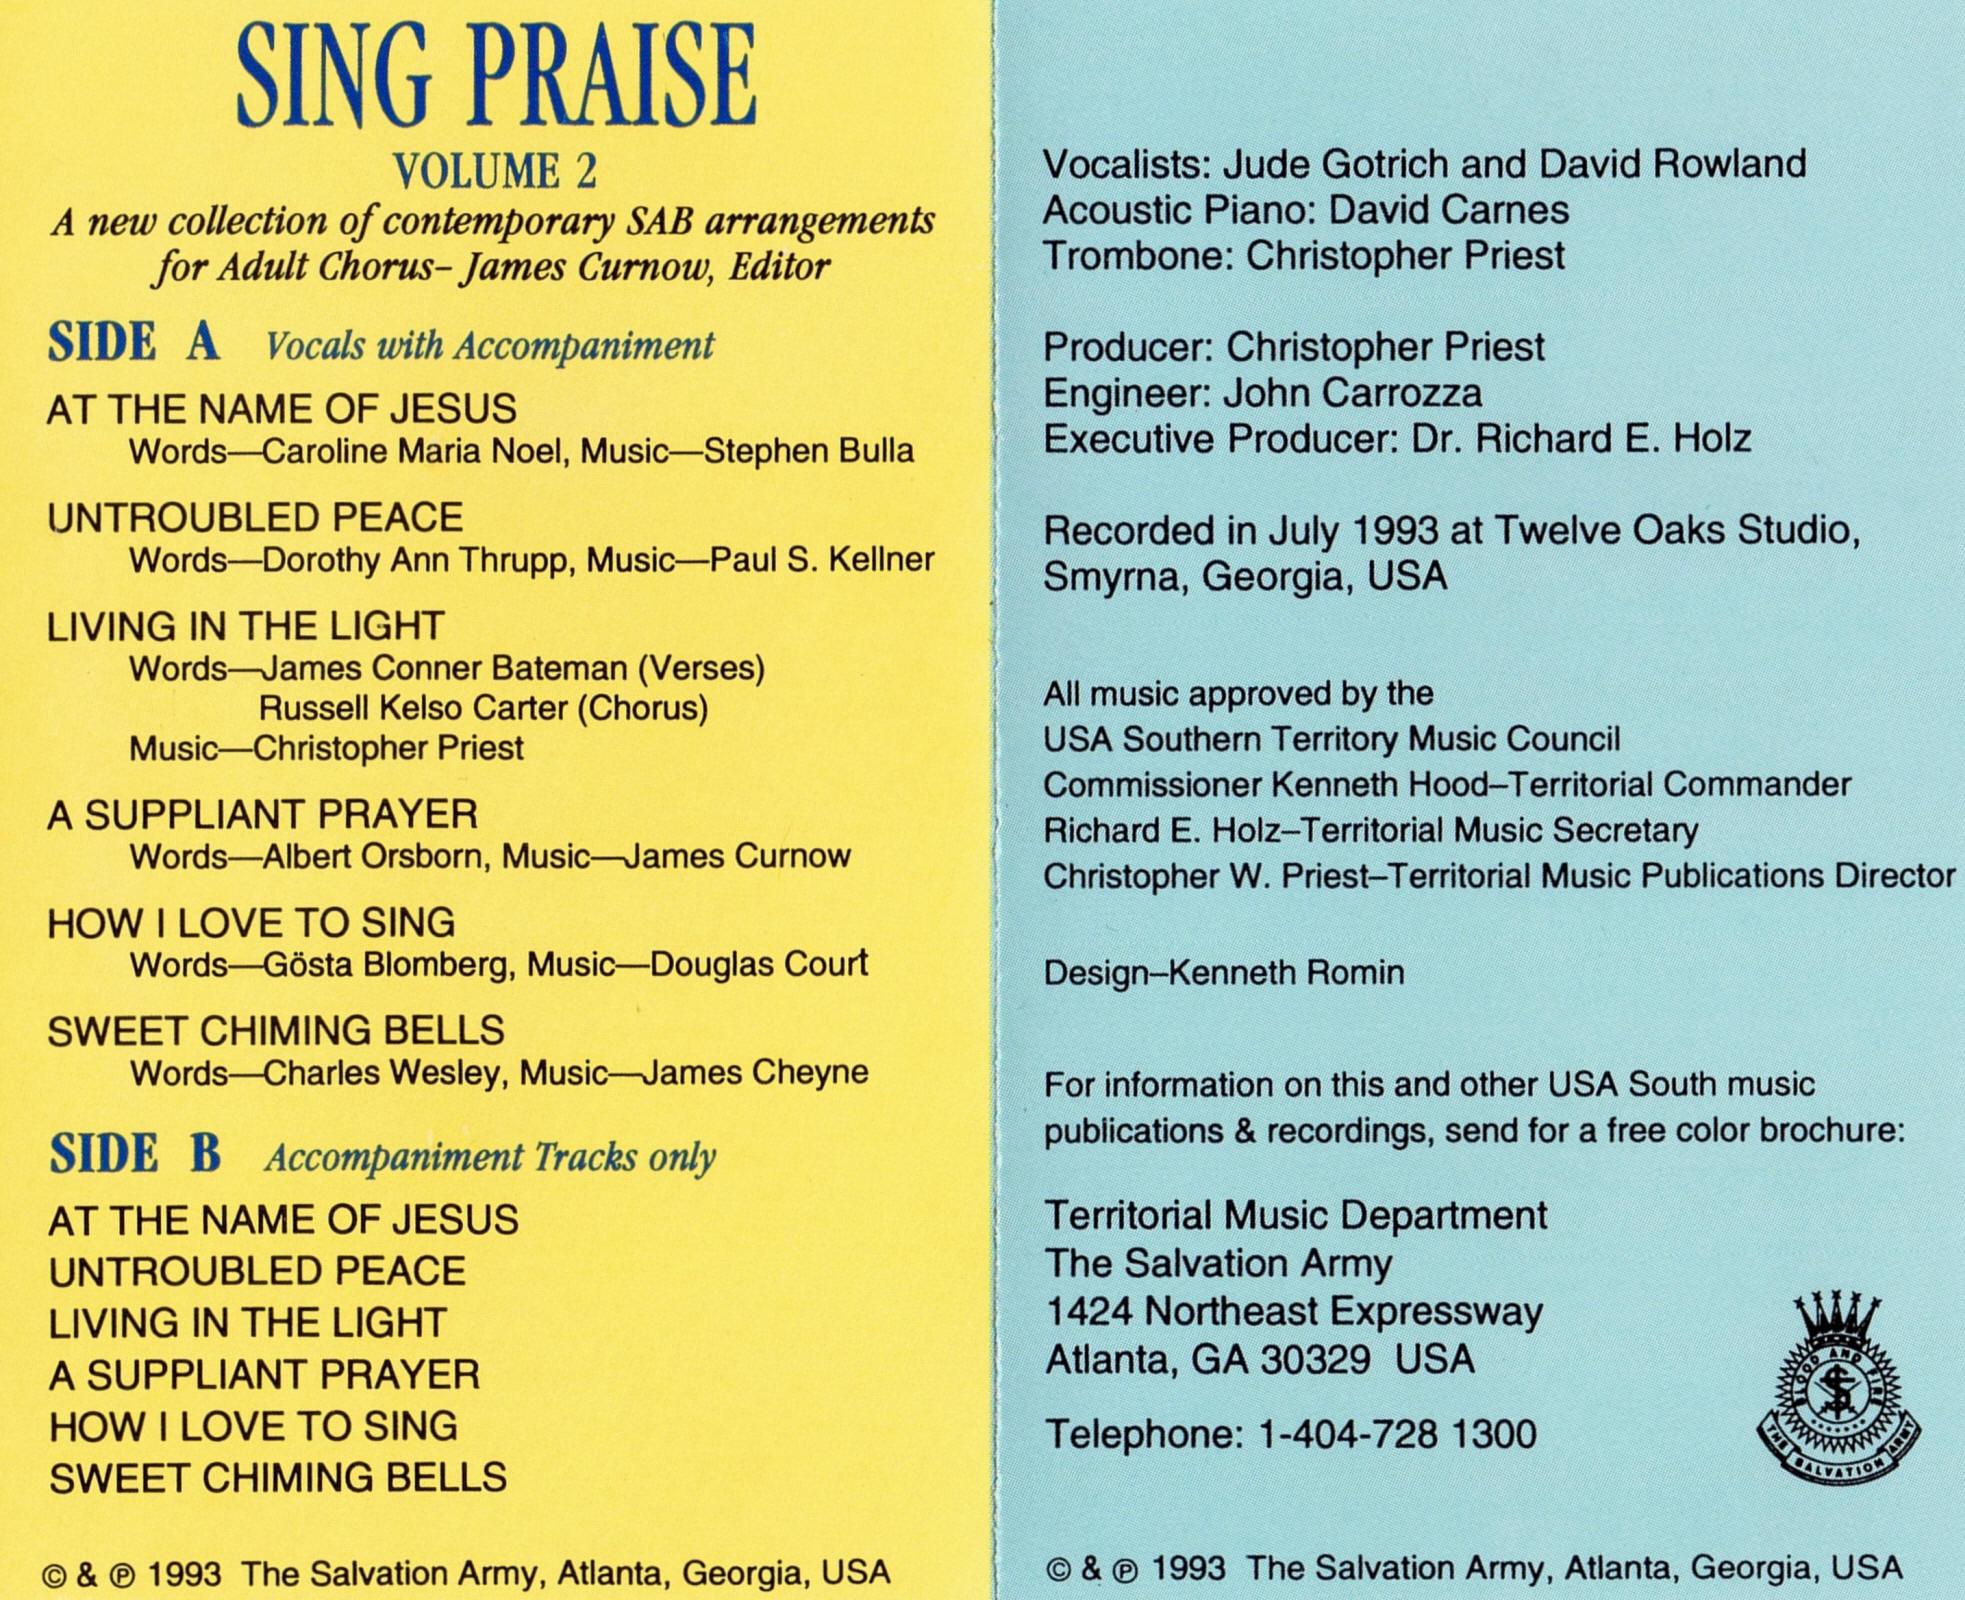 Sing Praise Vol  2 - 1993 - Regal Zonophone